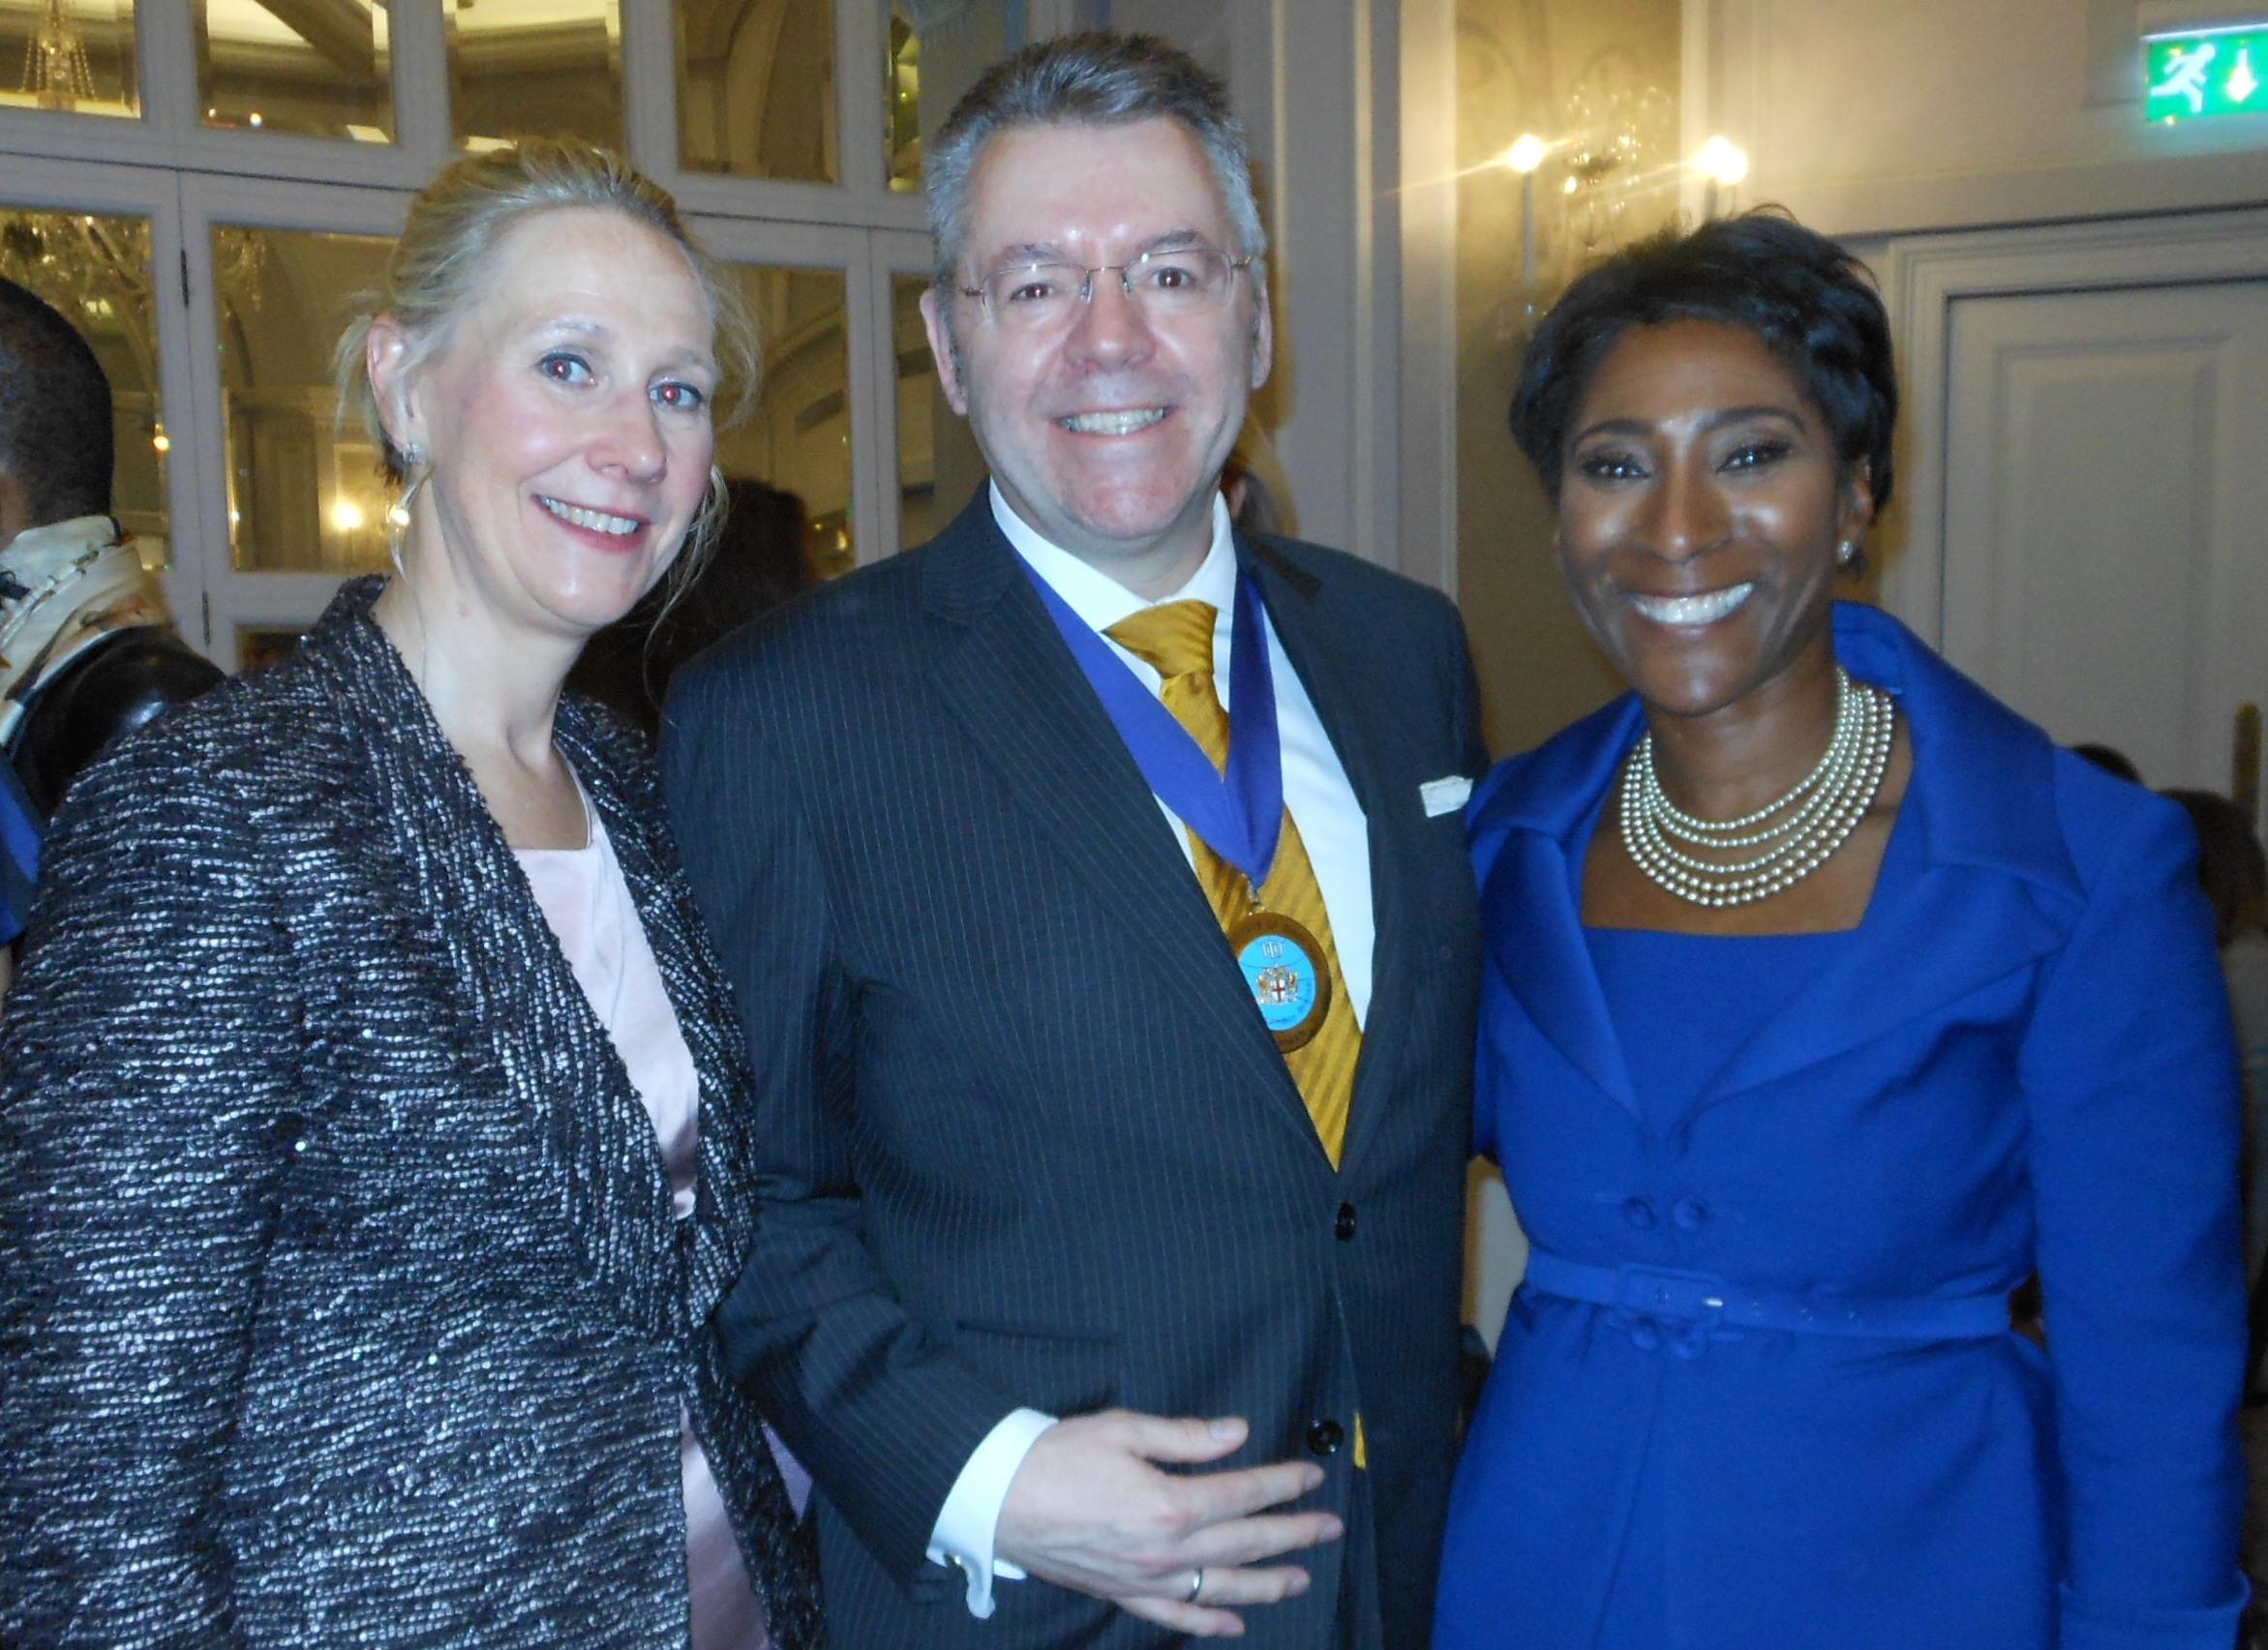 Right to left: Janet Thomas, WIBF President, David Stringer-Lamarre & Melanie Seymour, WIBF Vice President